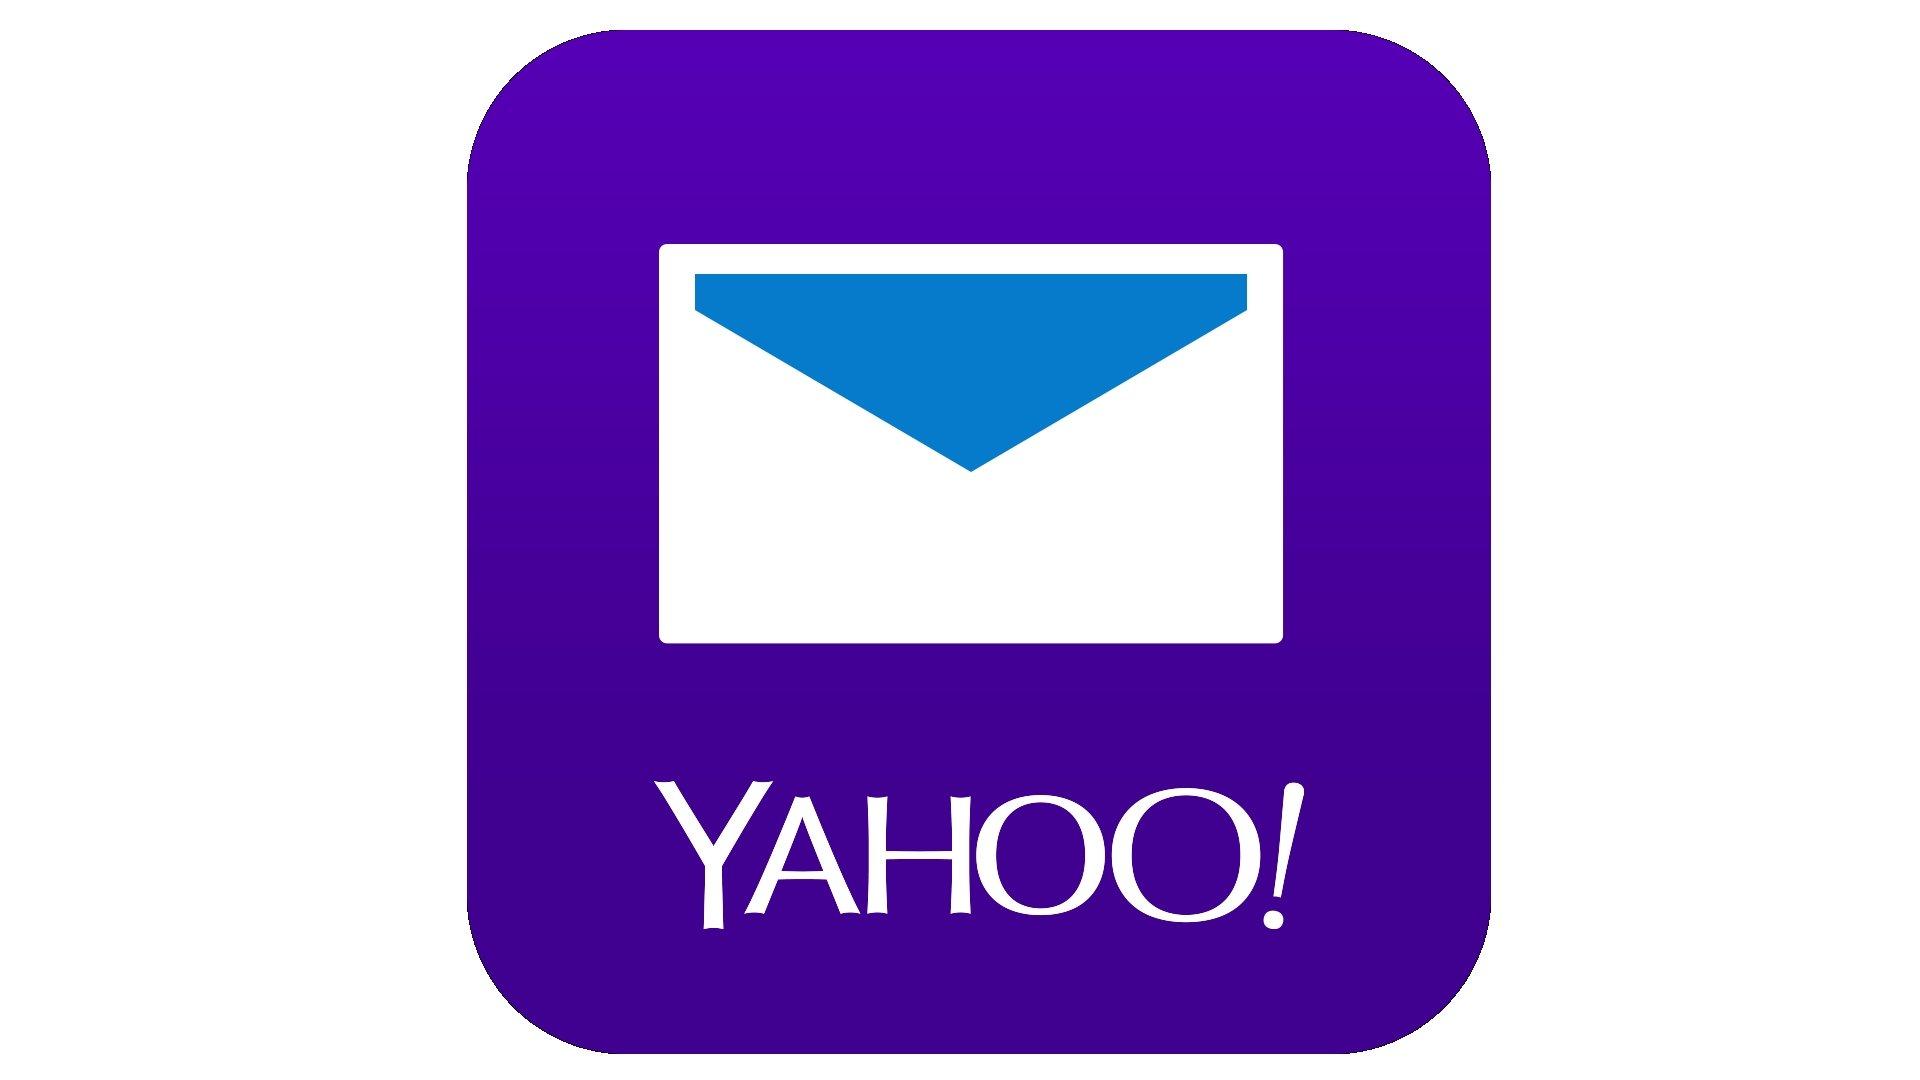 Poczta mail owa yahoo dating